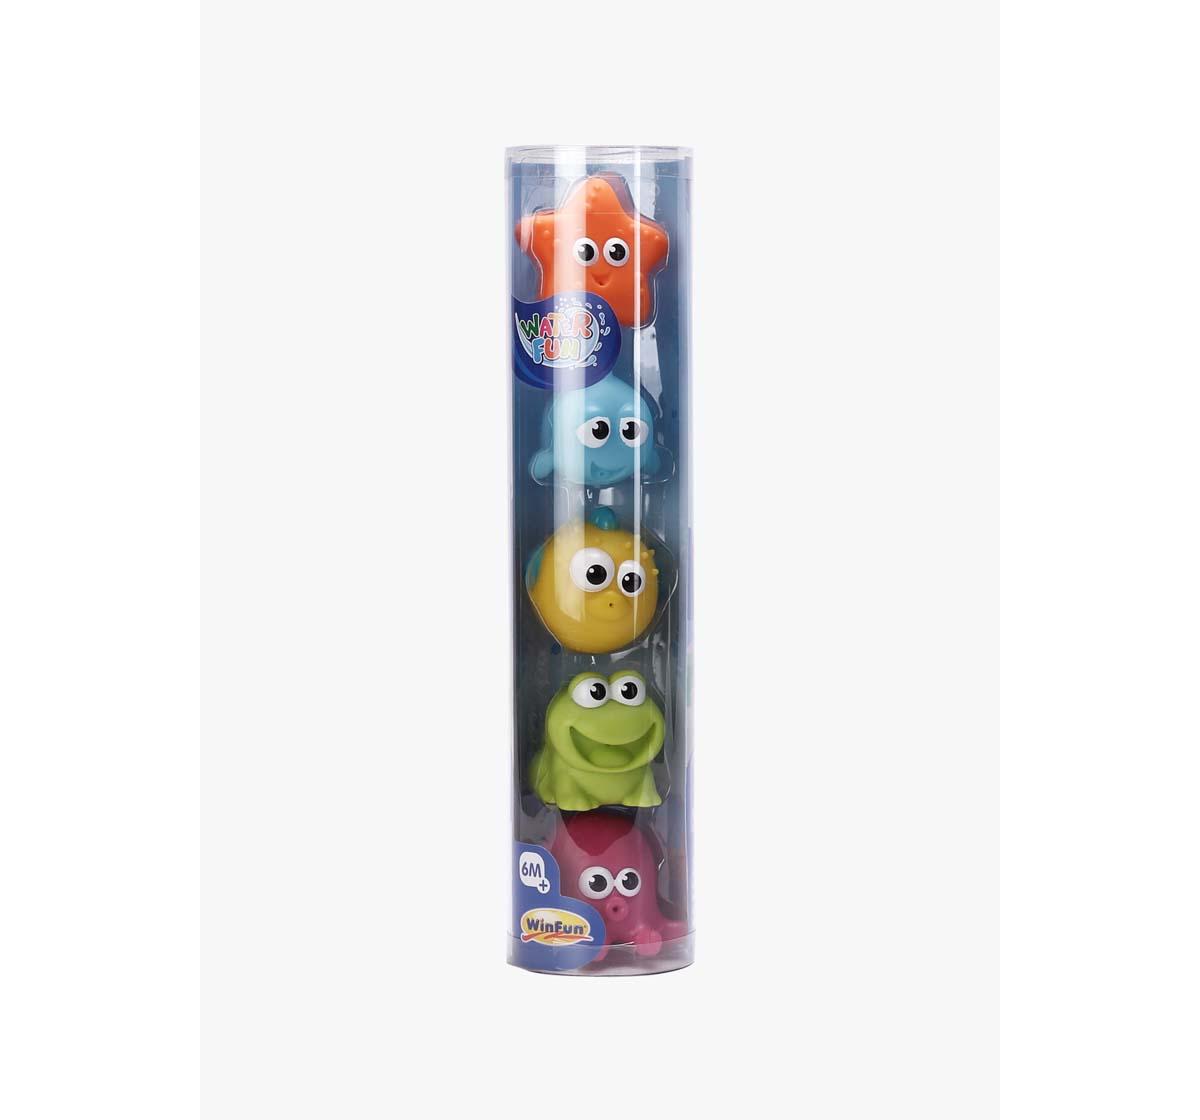 WinFun |  Winfun Splash 'N Squirt Bathtime Pals 5 Pcs Toys & Accessories for Kids age 6M+